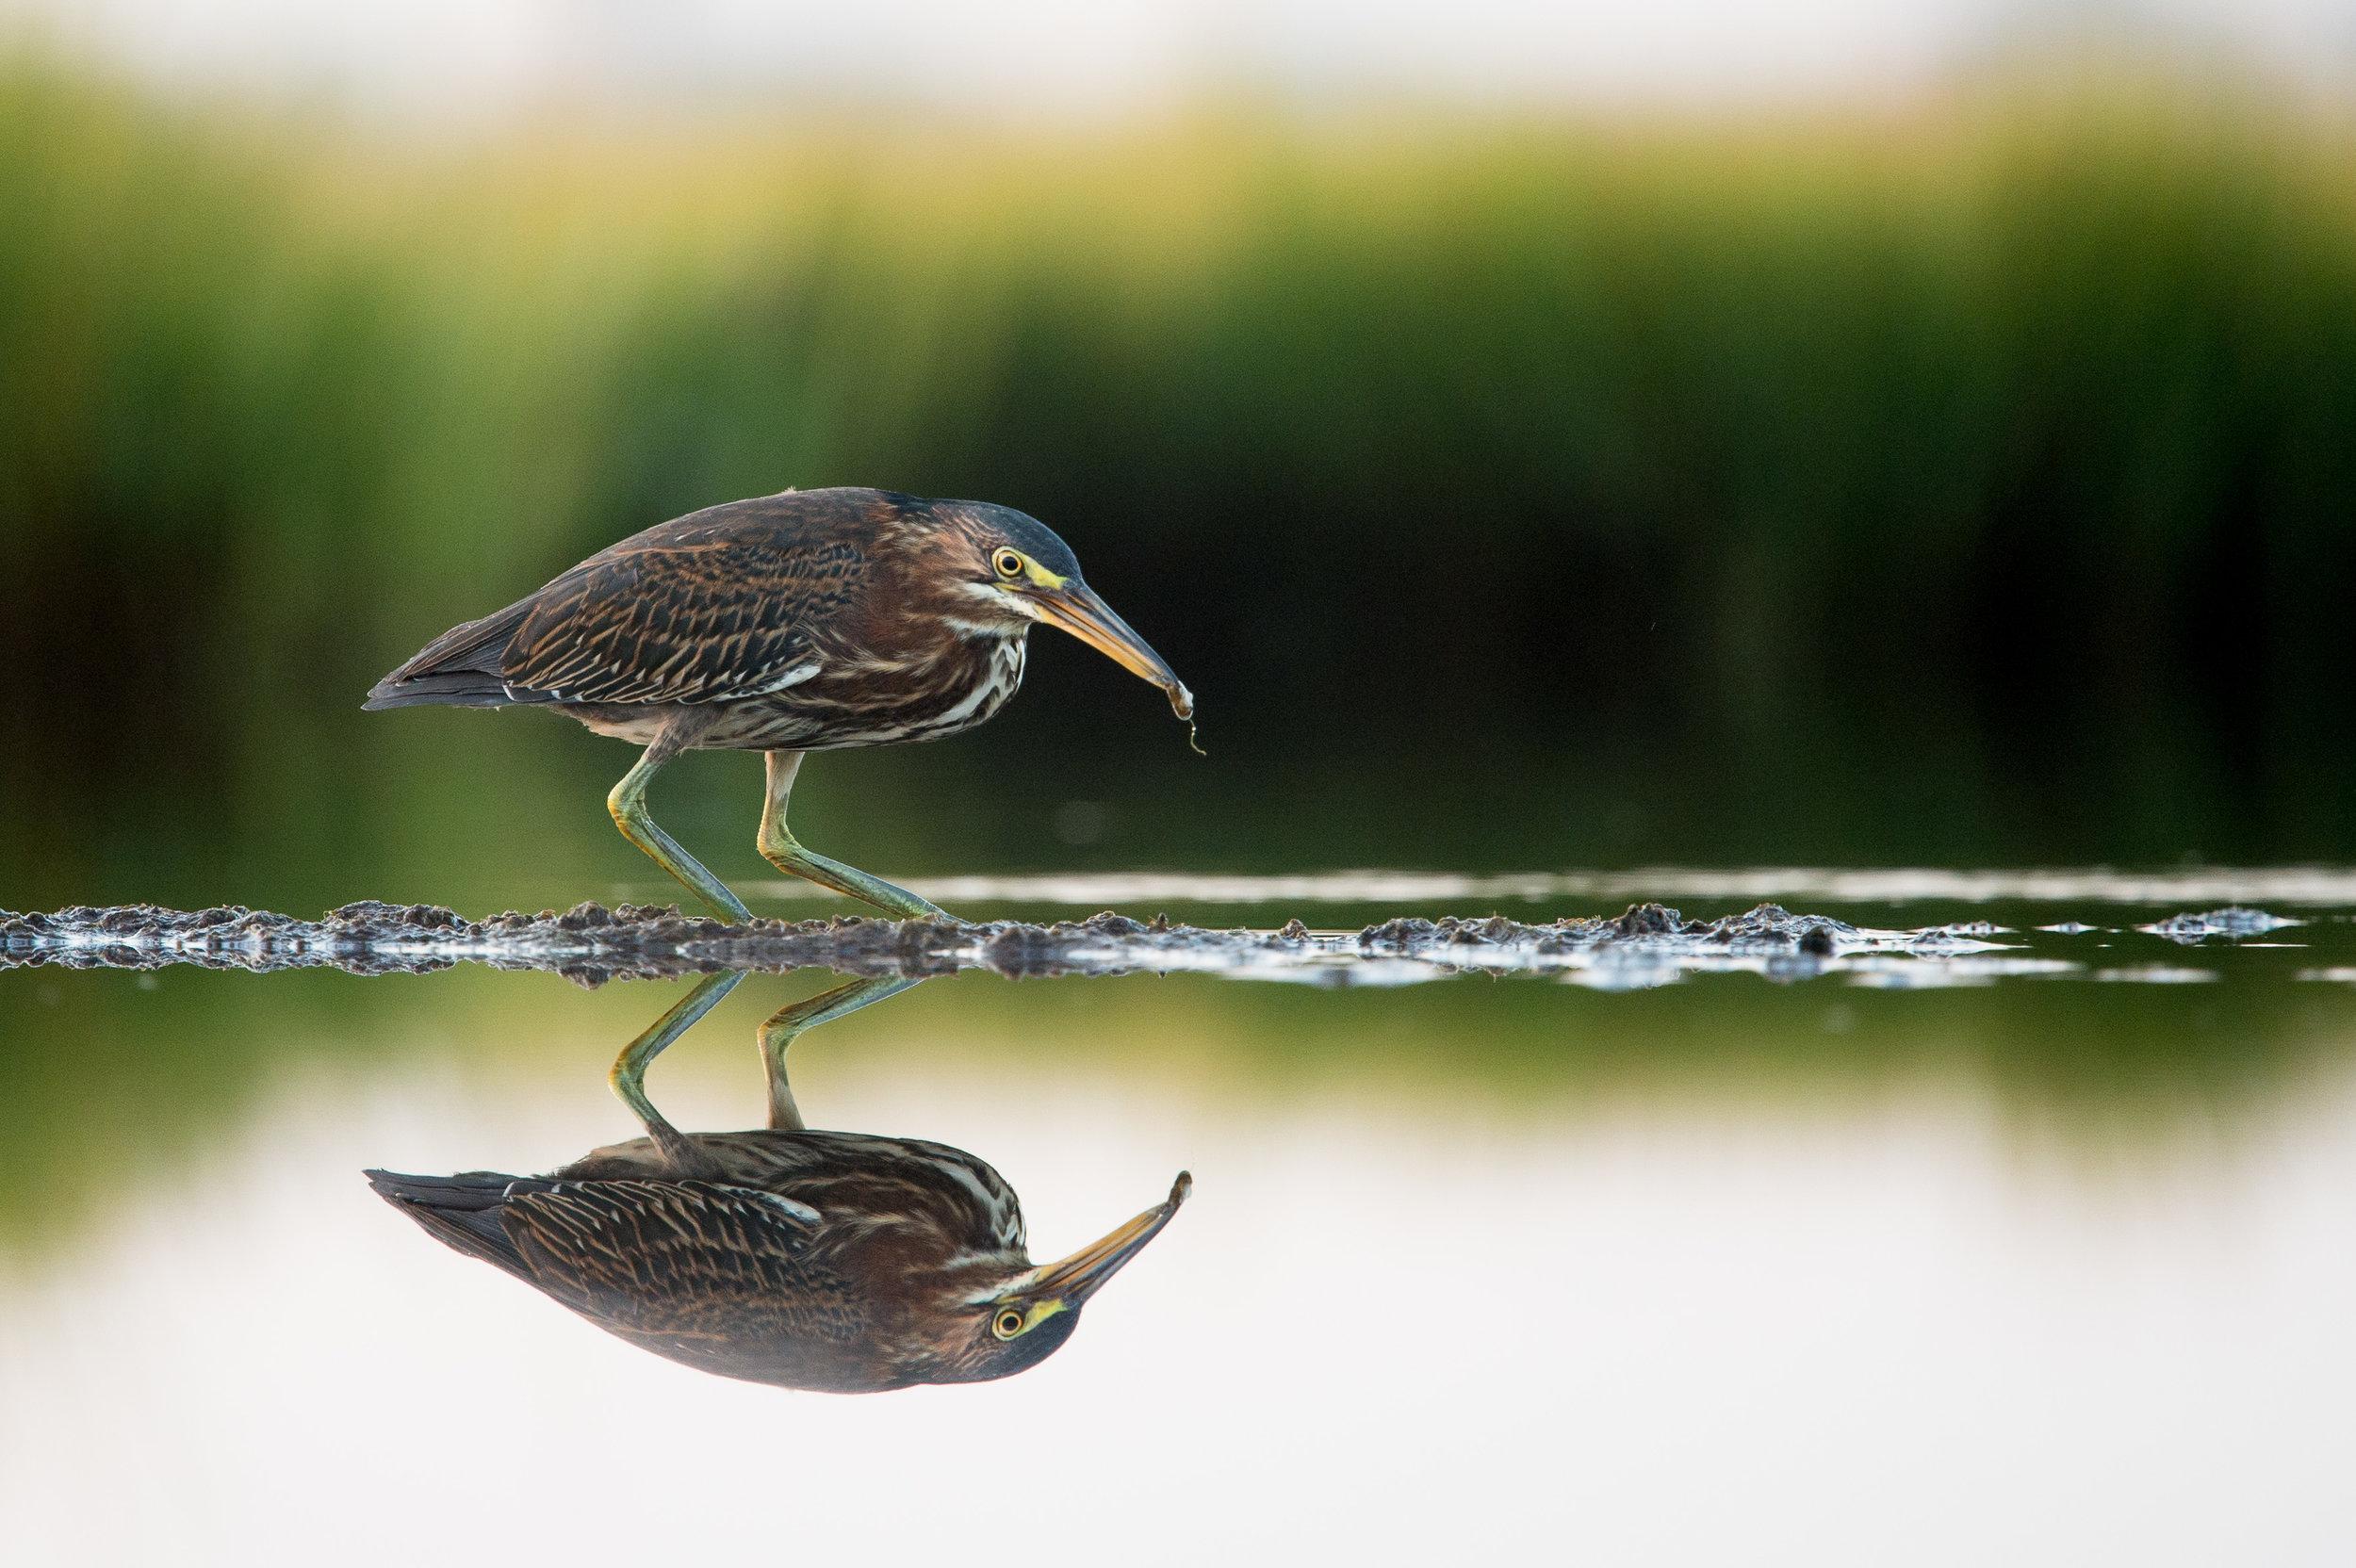 006_jersey_shorebirds.jpg